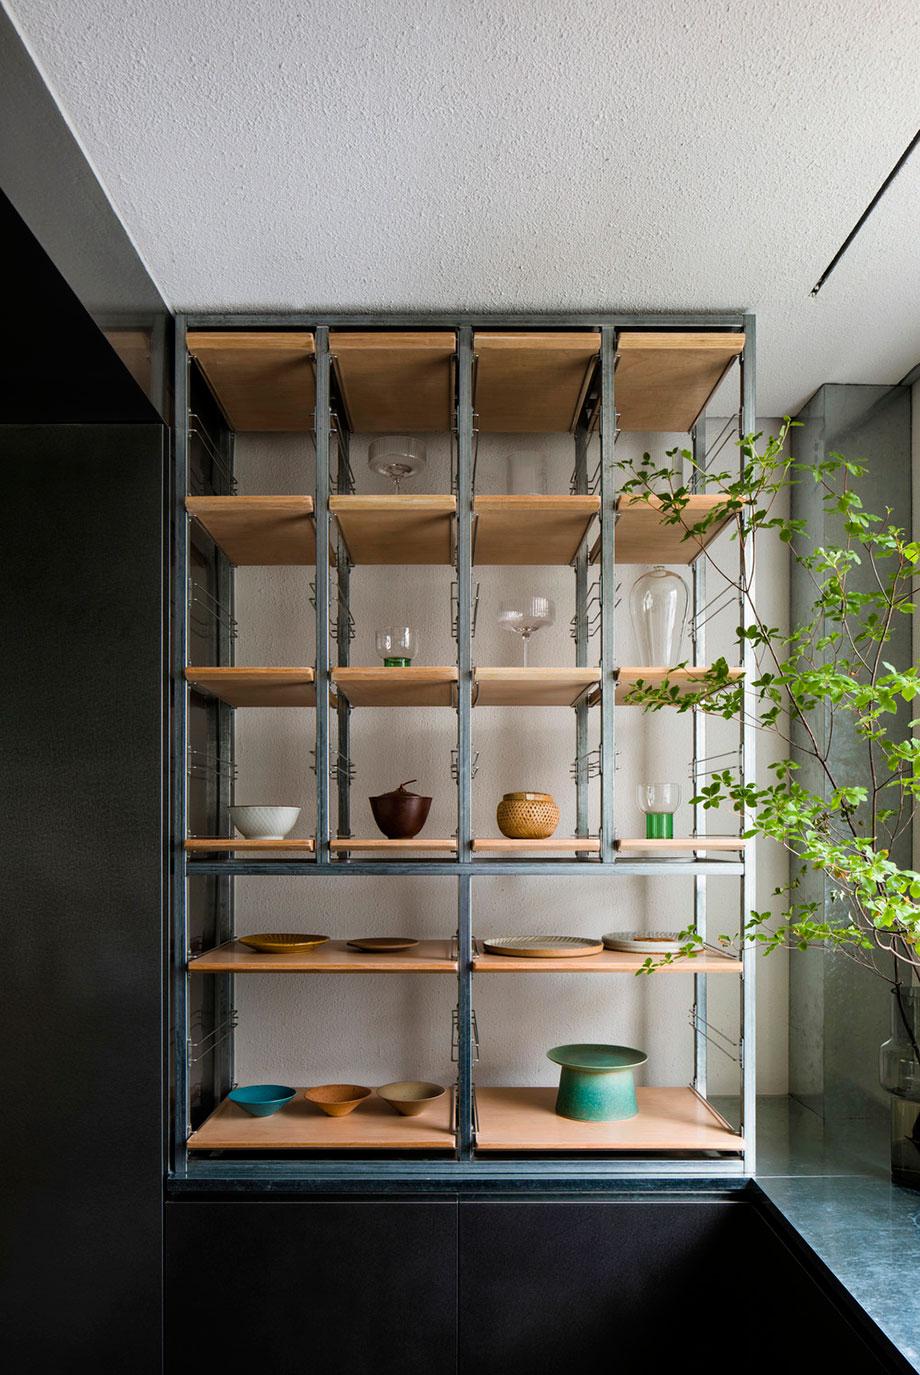 the zentral kitchen de lukstudio (13) - foto peter dixie